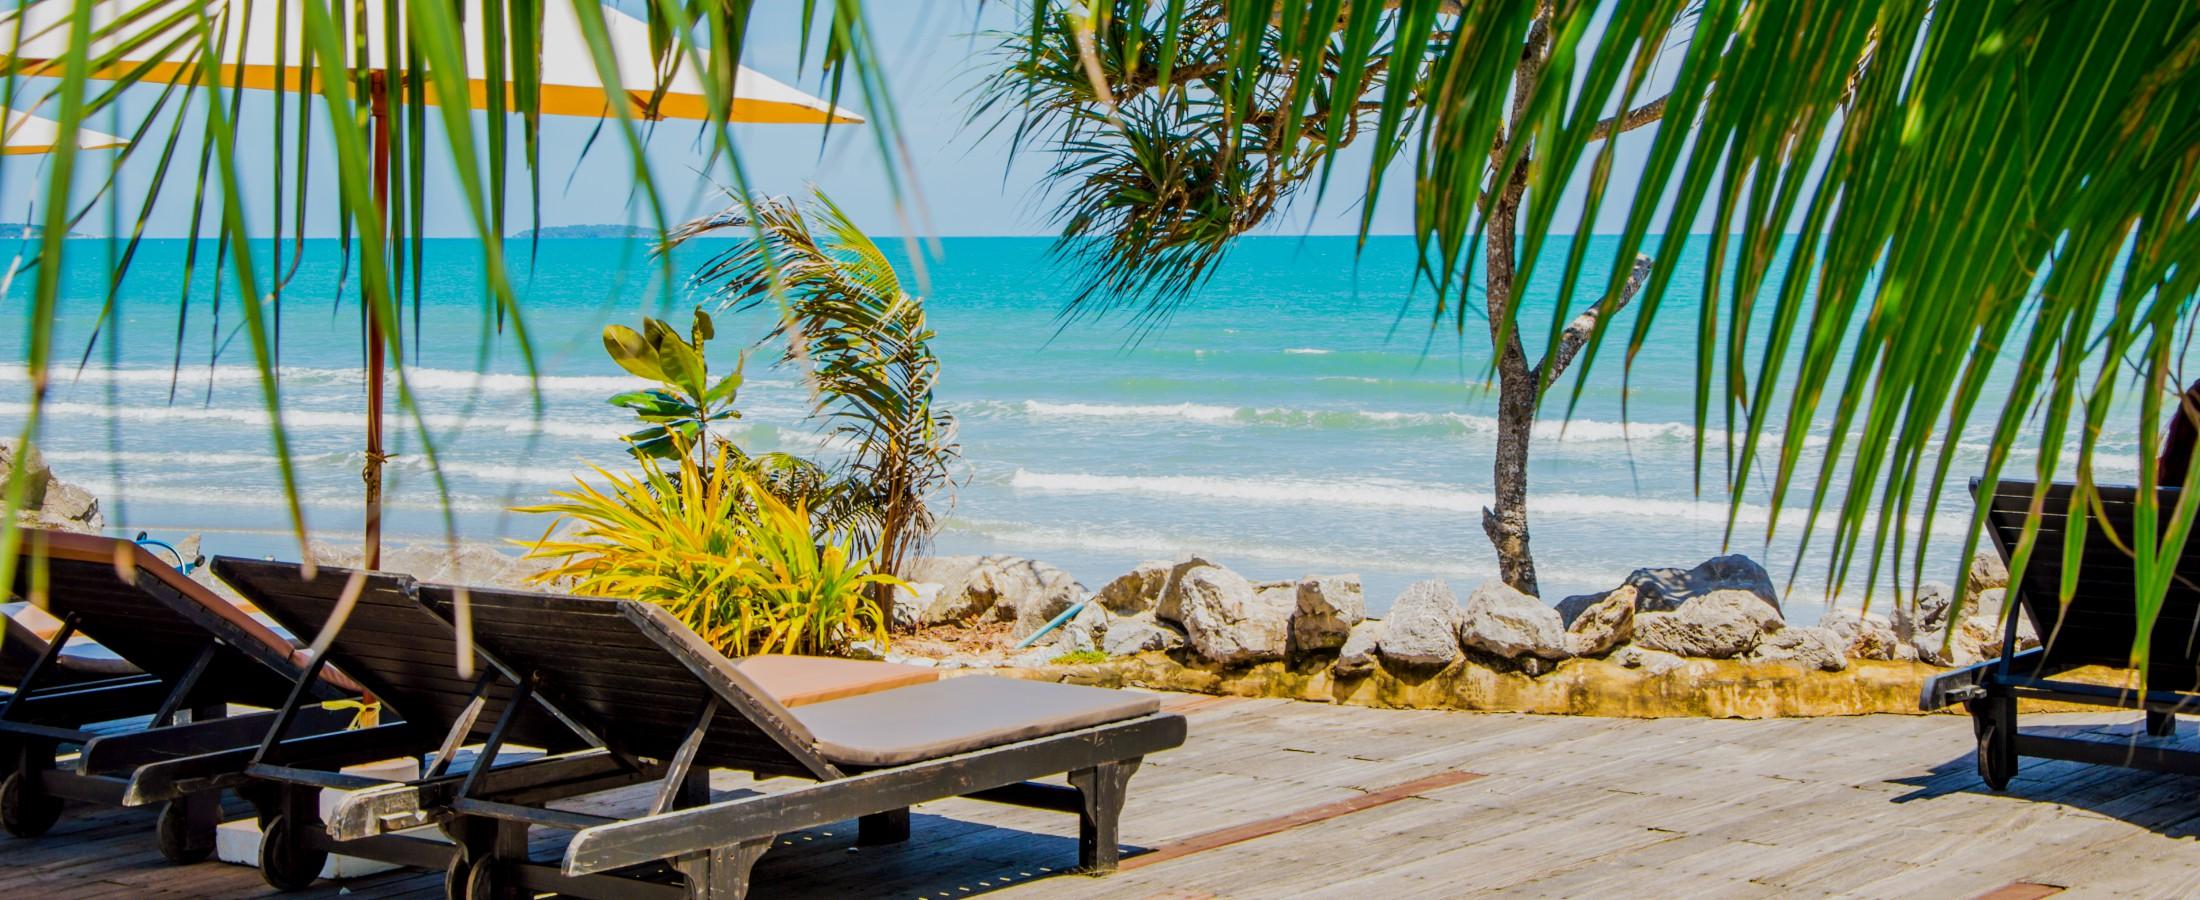 Southwest Florida Homes For Sale Southwest Florida Real